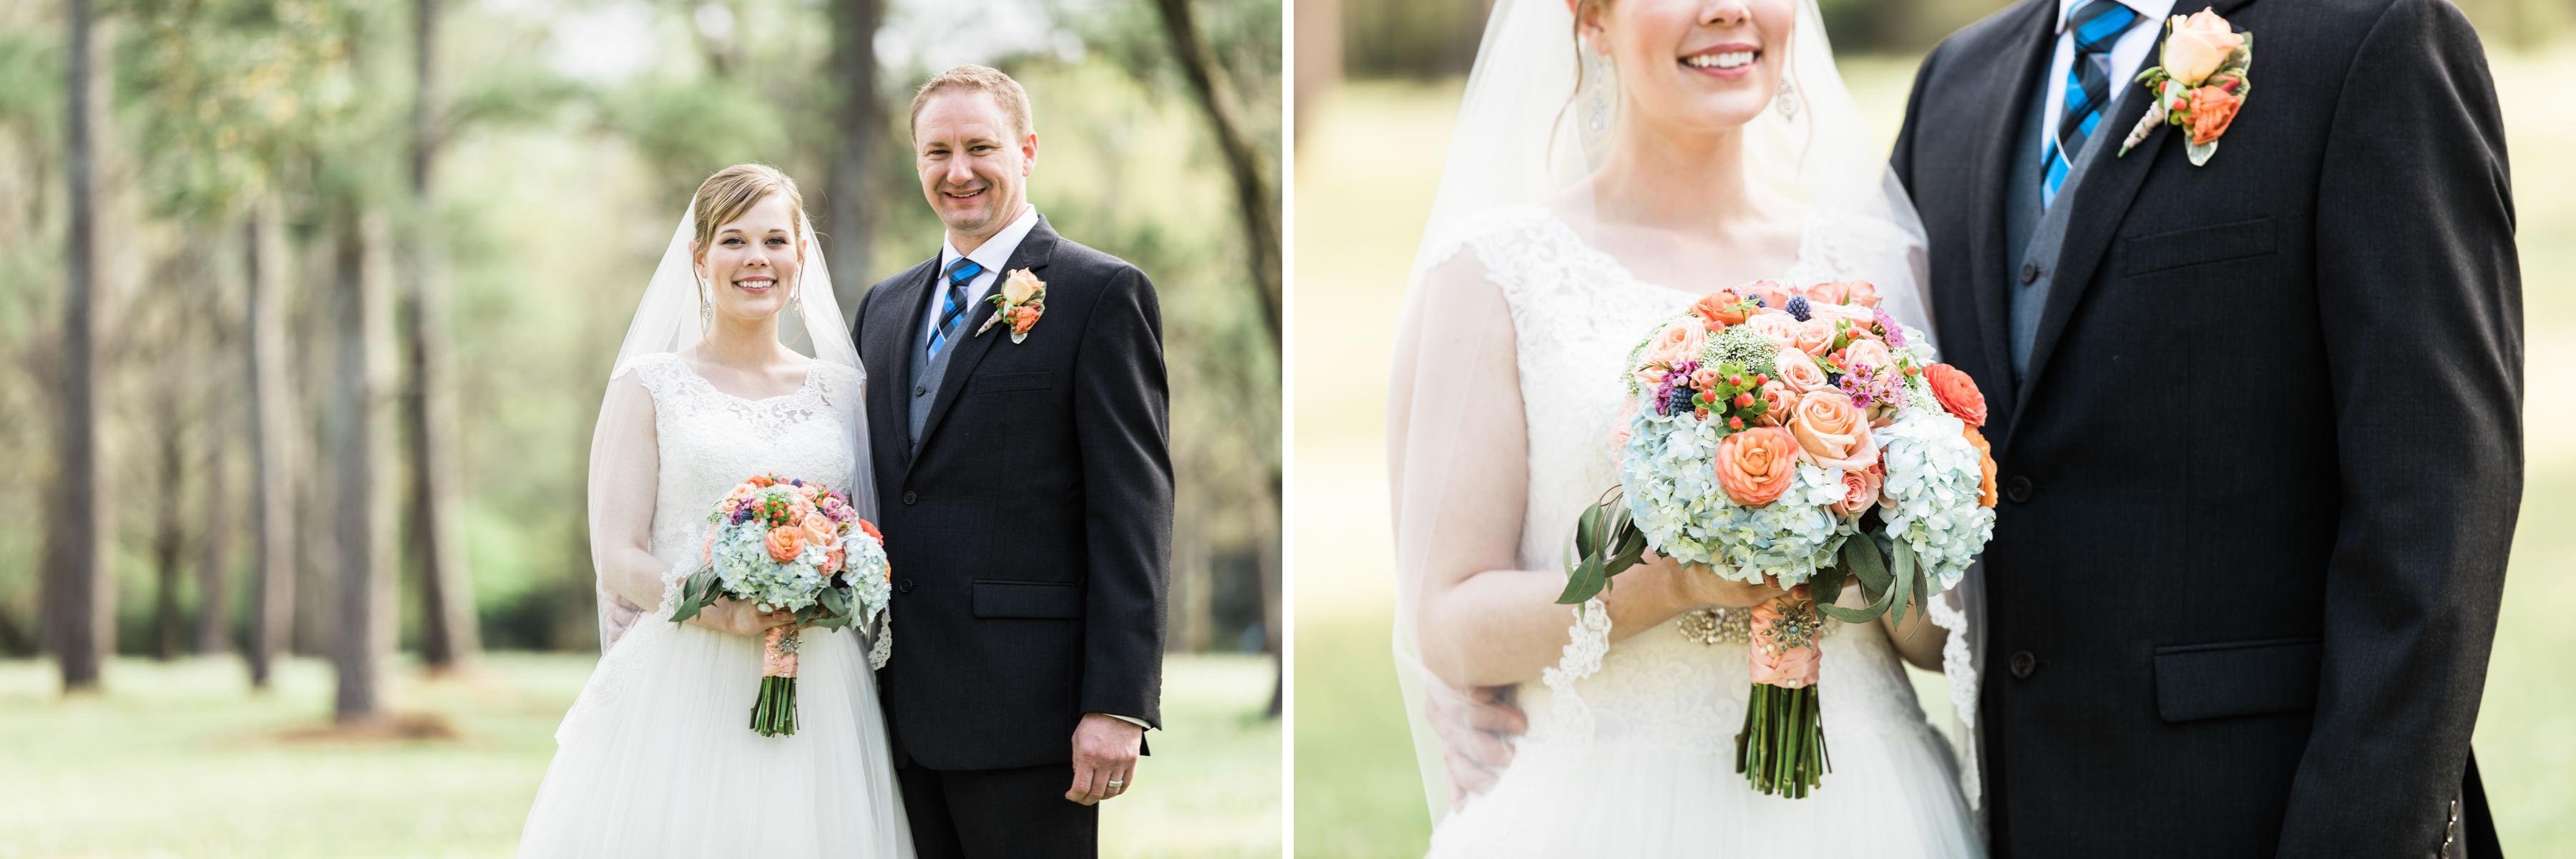 MAULDIN_WEDDING_MONTGOMERY_ALABAMA_WEDDING_PHOTOGRAPHY_74